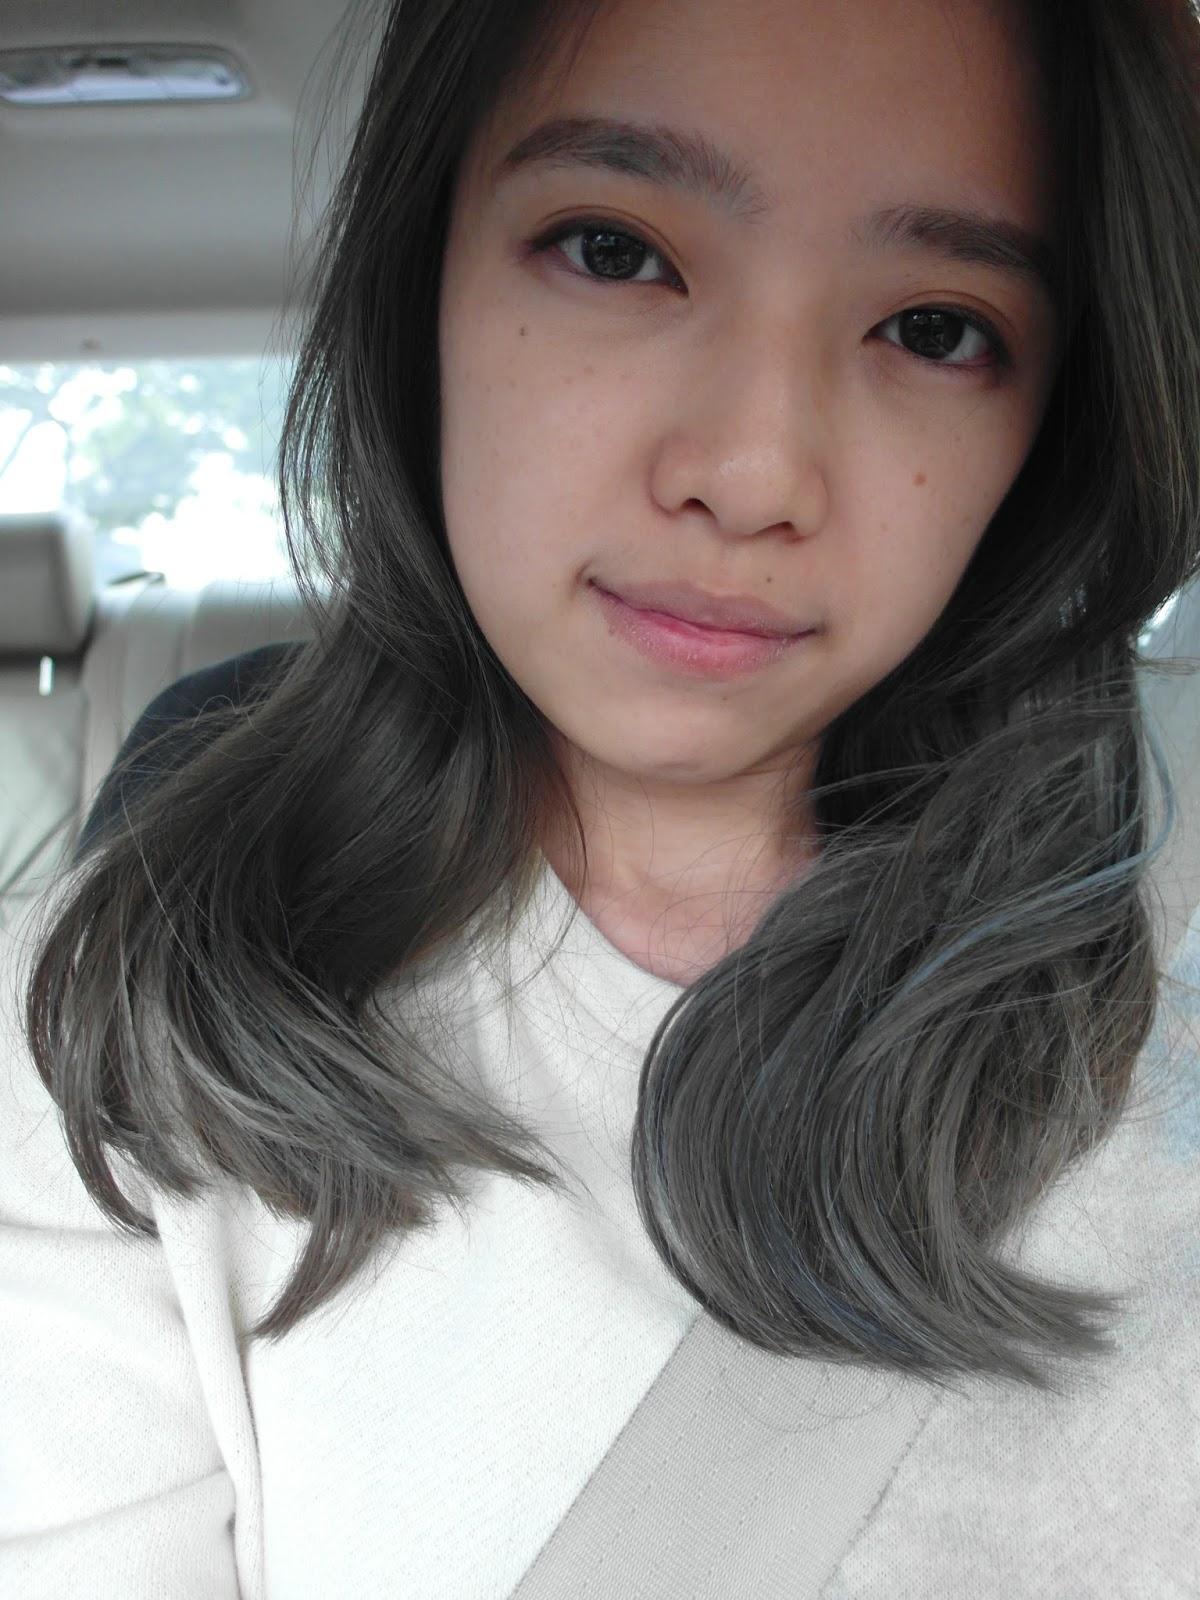 How To Dye Hair A Dark Almost Black Grey  FancyFollicles